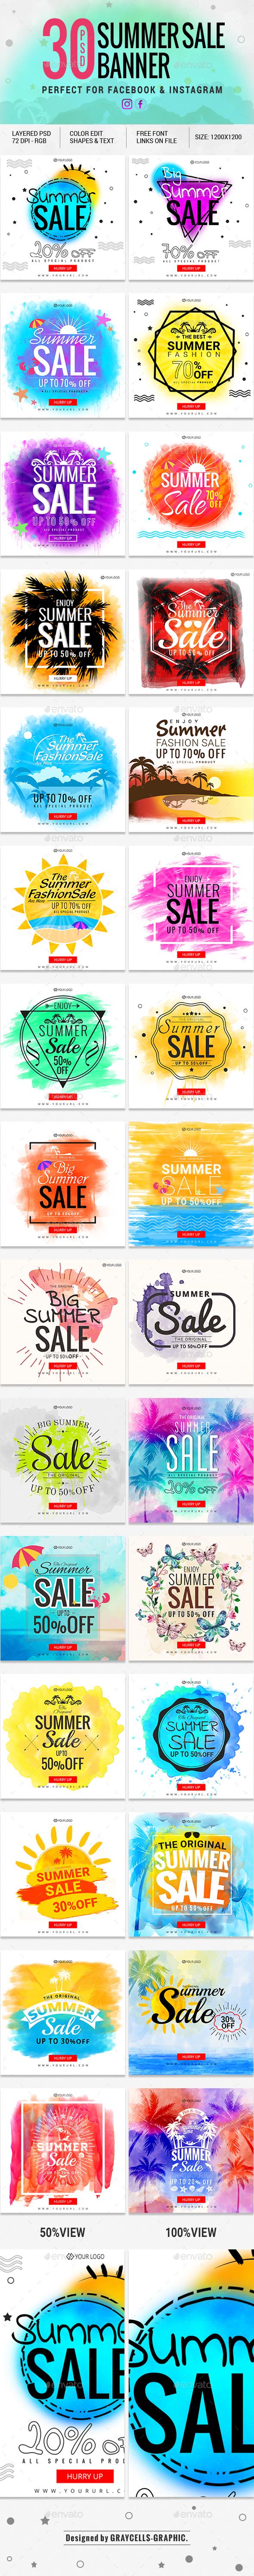 30 Facebook Creative Banners - Social Media Web Elements